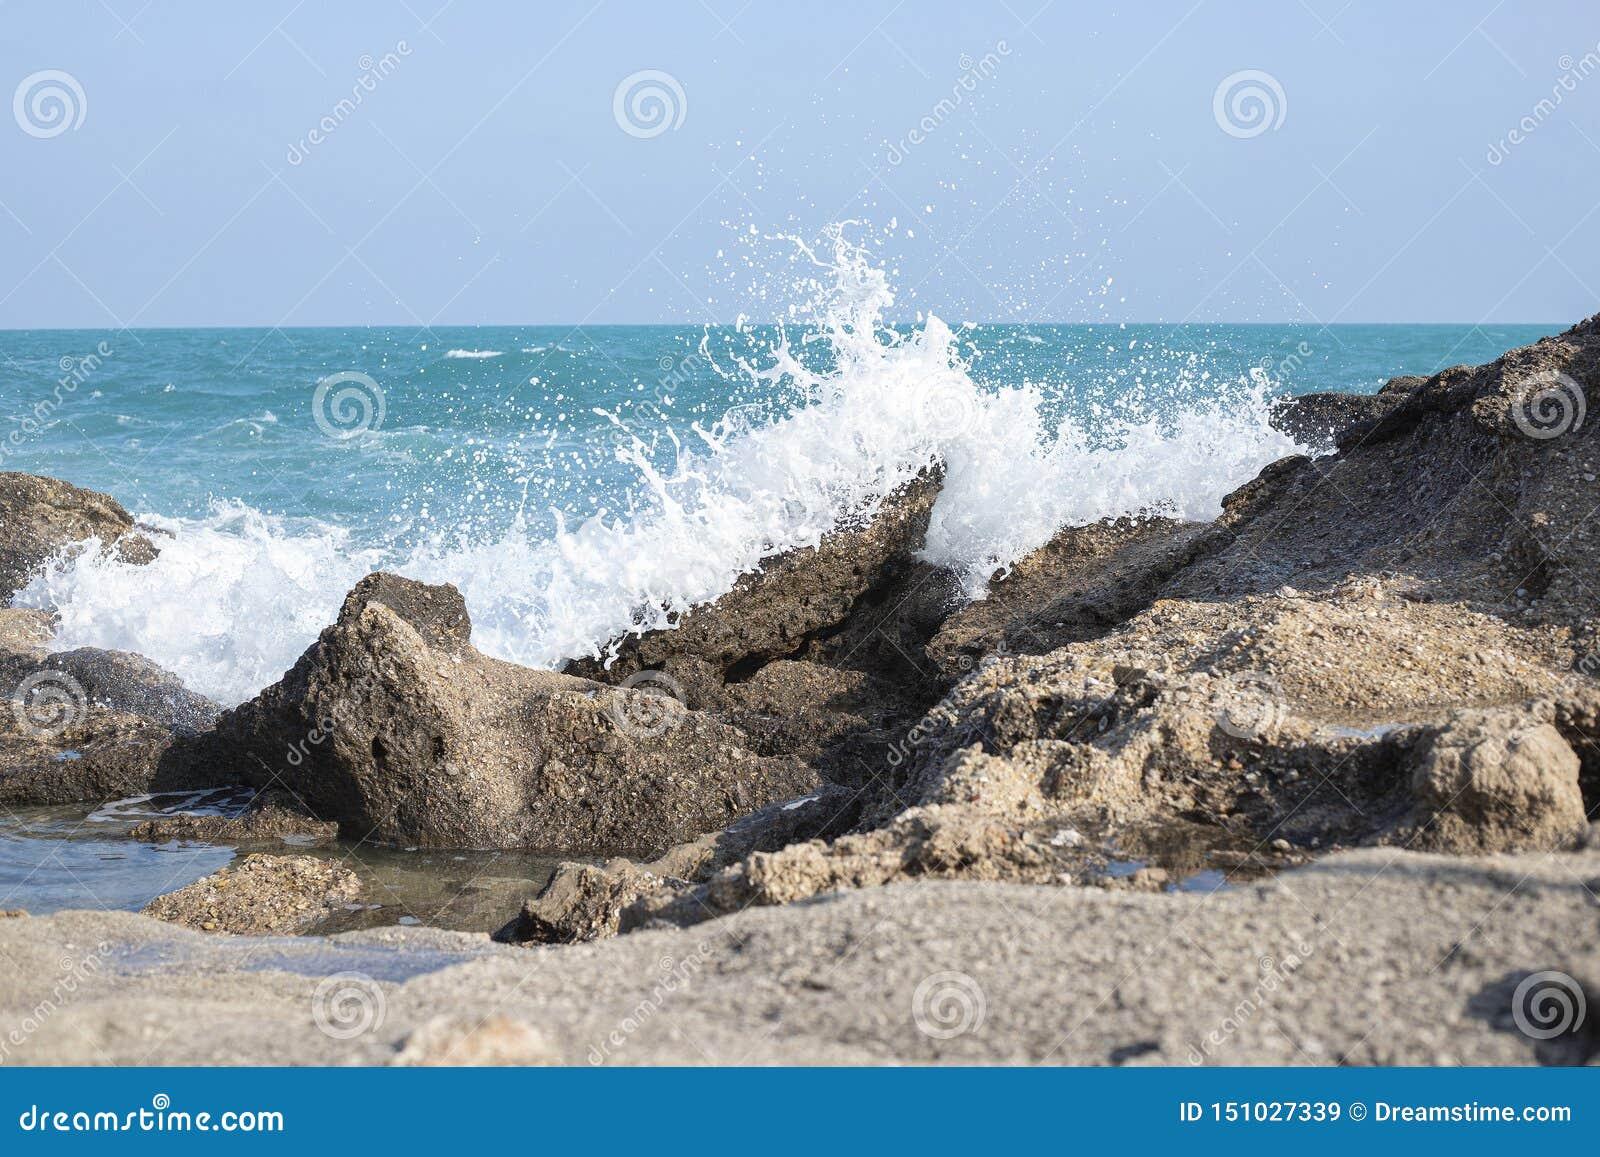 Waves blue sea stones storm nature background